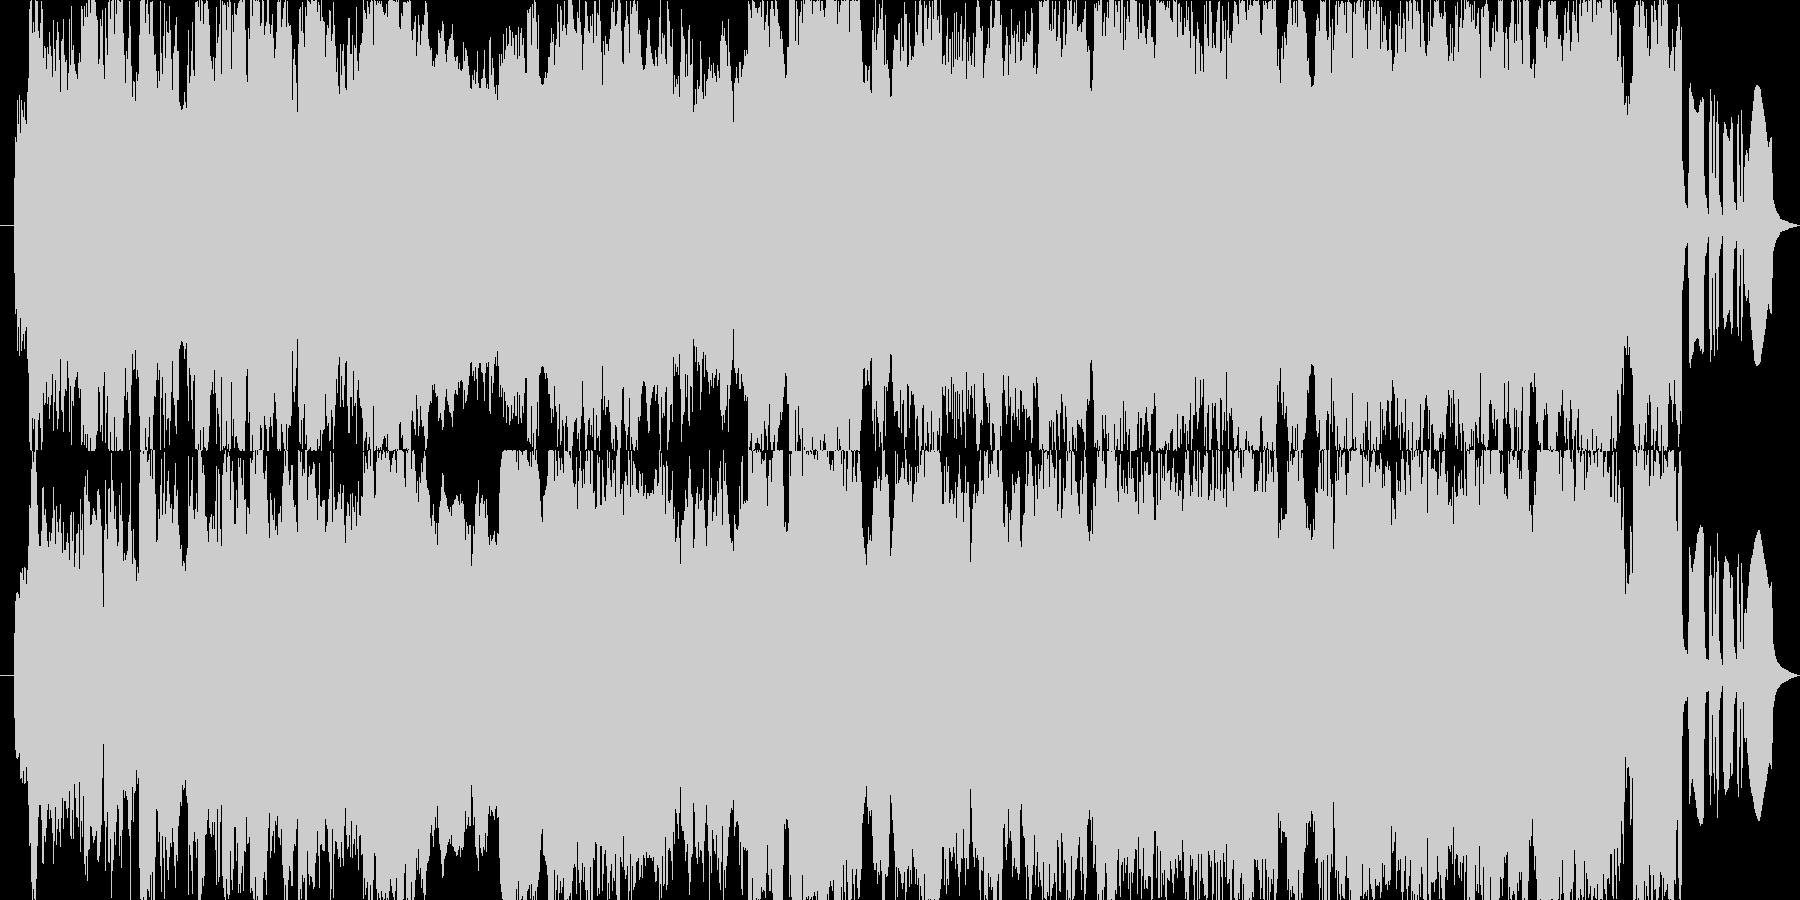 RPGのメインテーマをイメージした楽曲…の未再生の波形